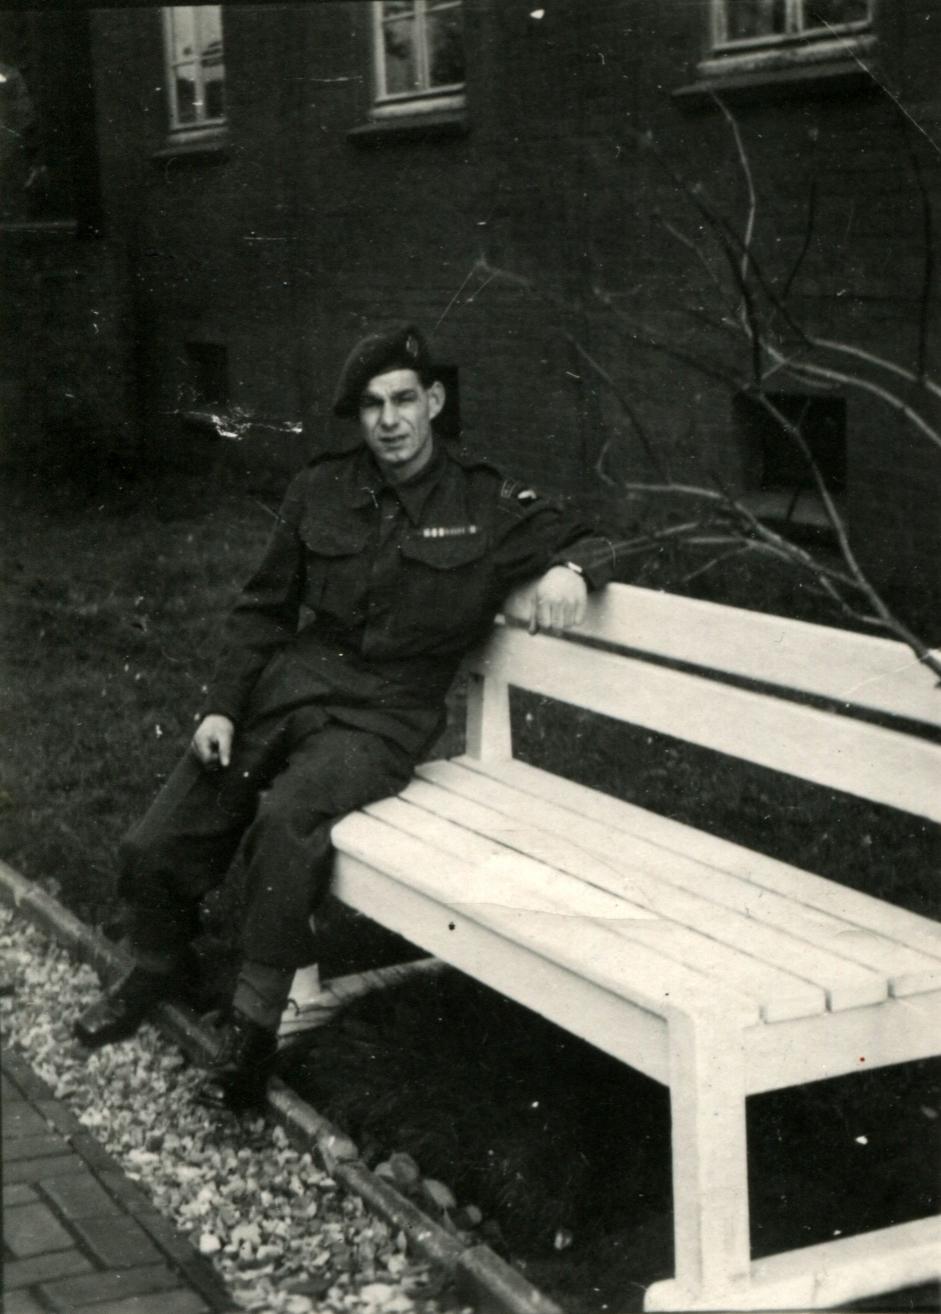 RAF Regiment Serviceman Reclining On Bench, 30th October 1946